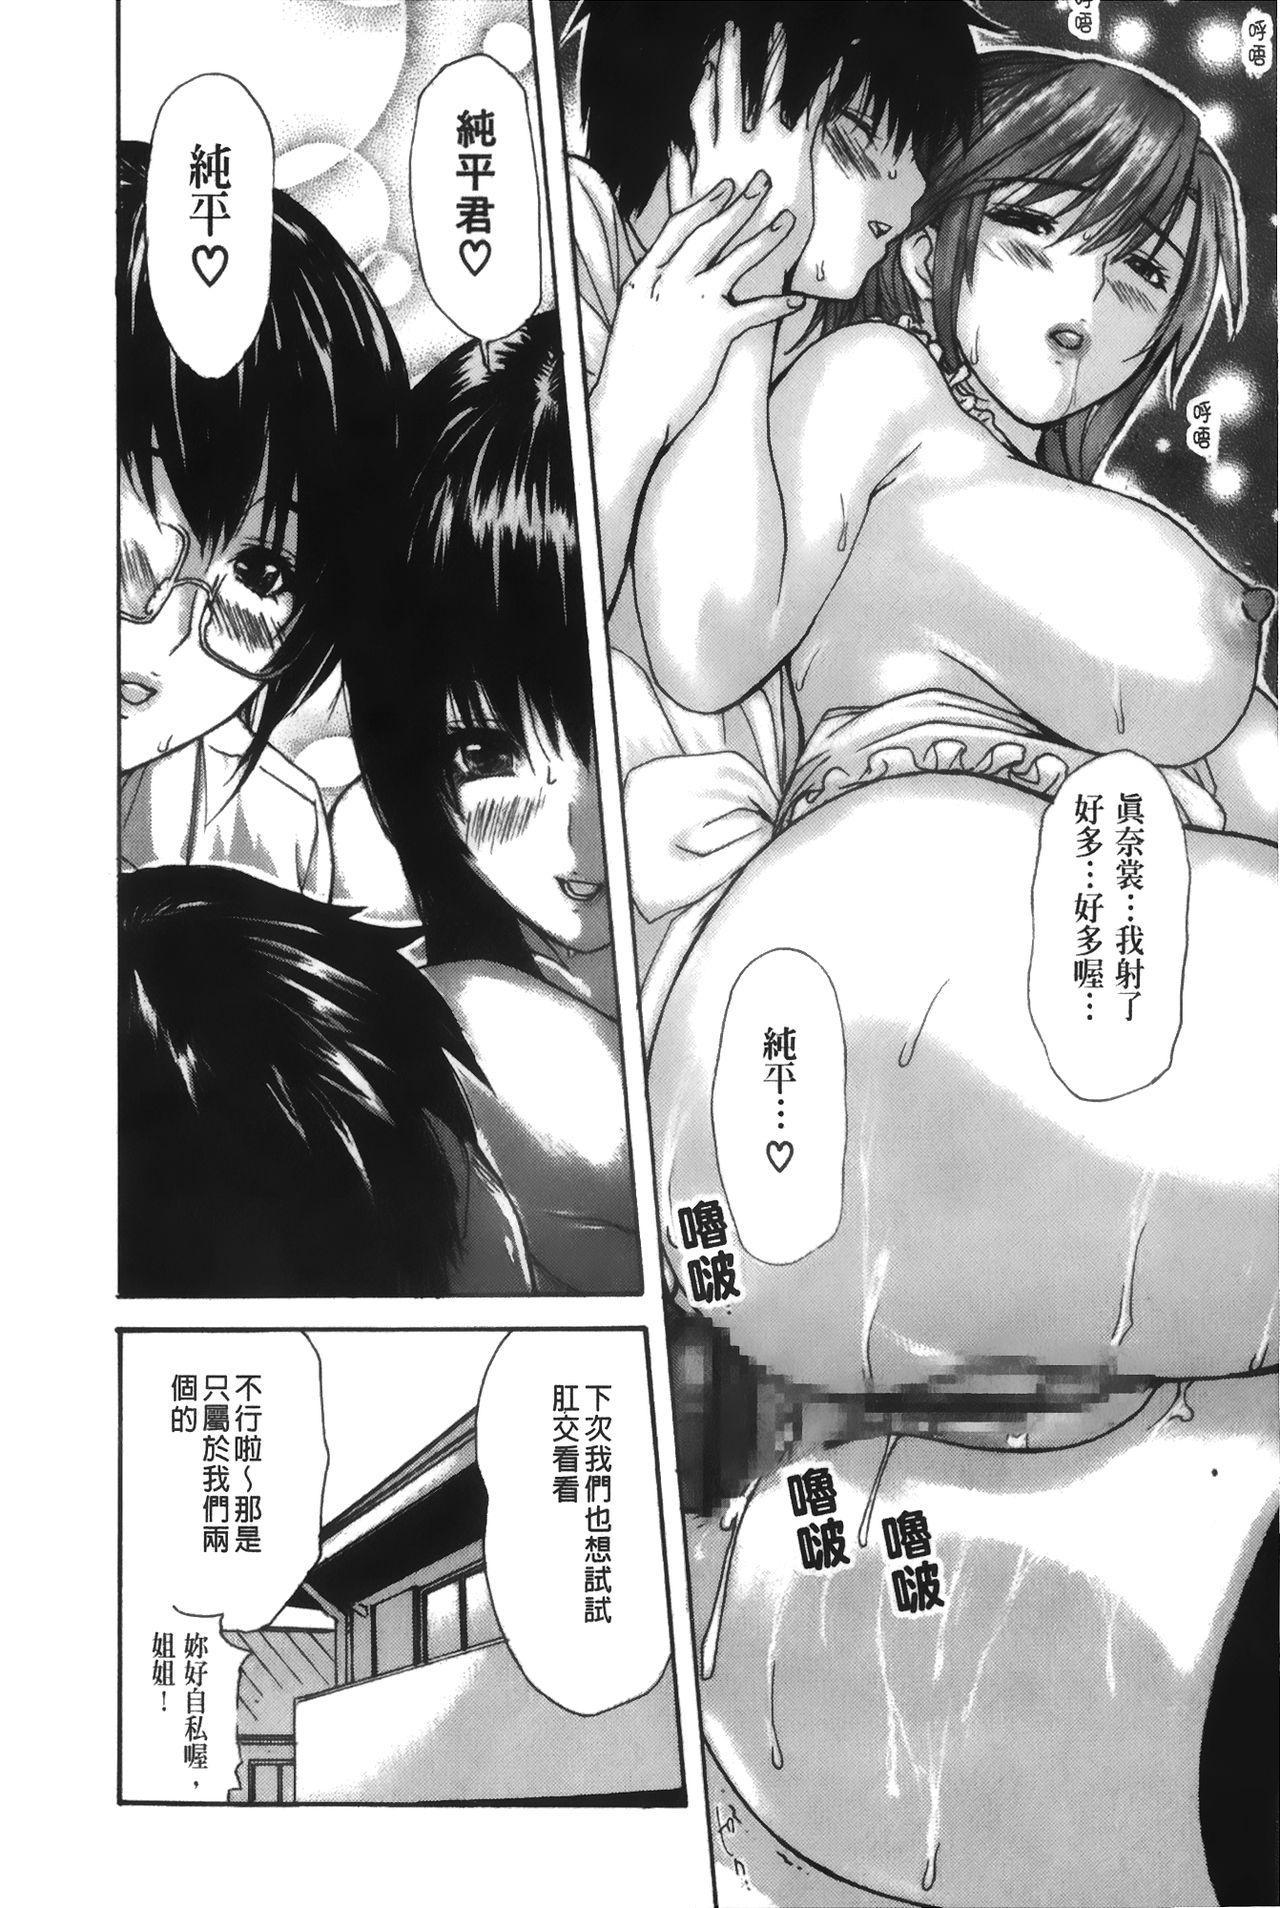 Tonari no Minano Sensei 4 | 隔壁的美奈乃老師 4 49